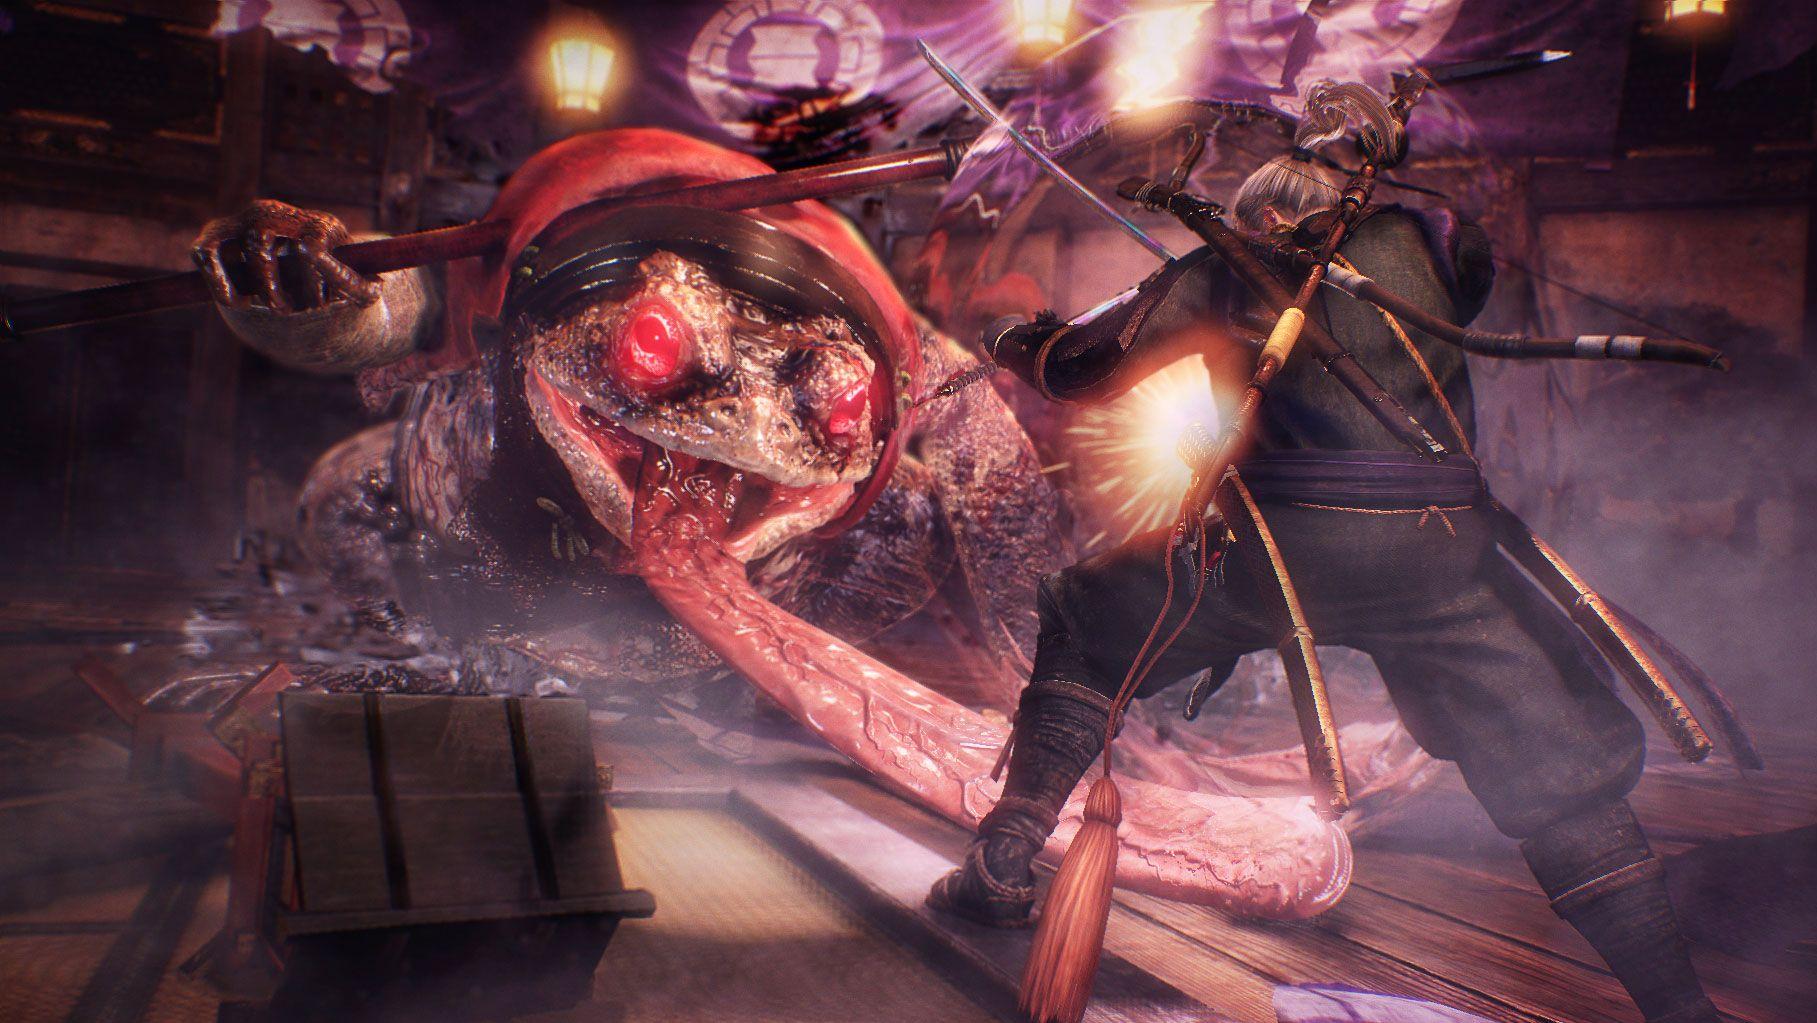 Nioh, one of the best games like Dark Souls.